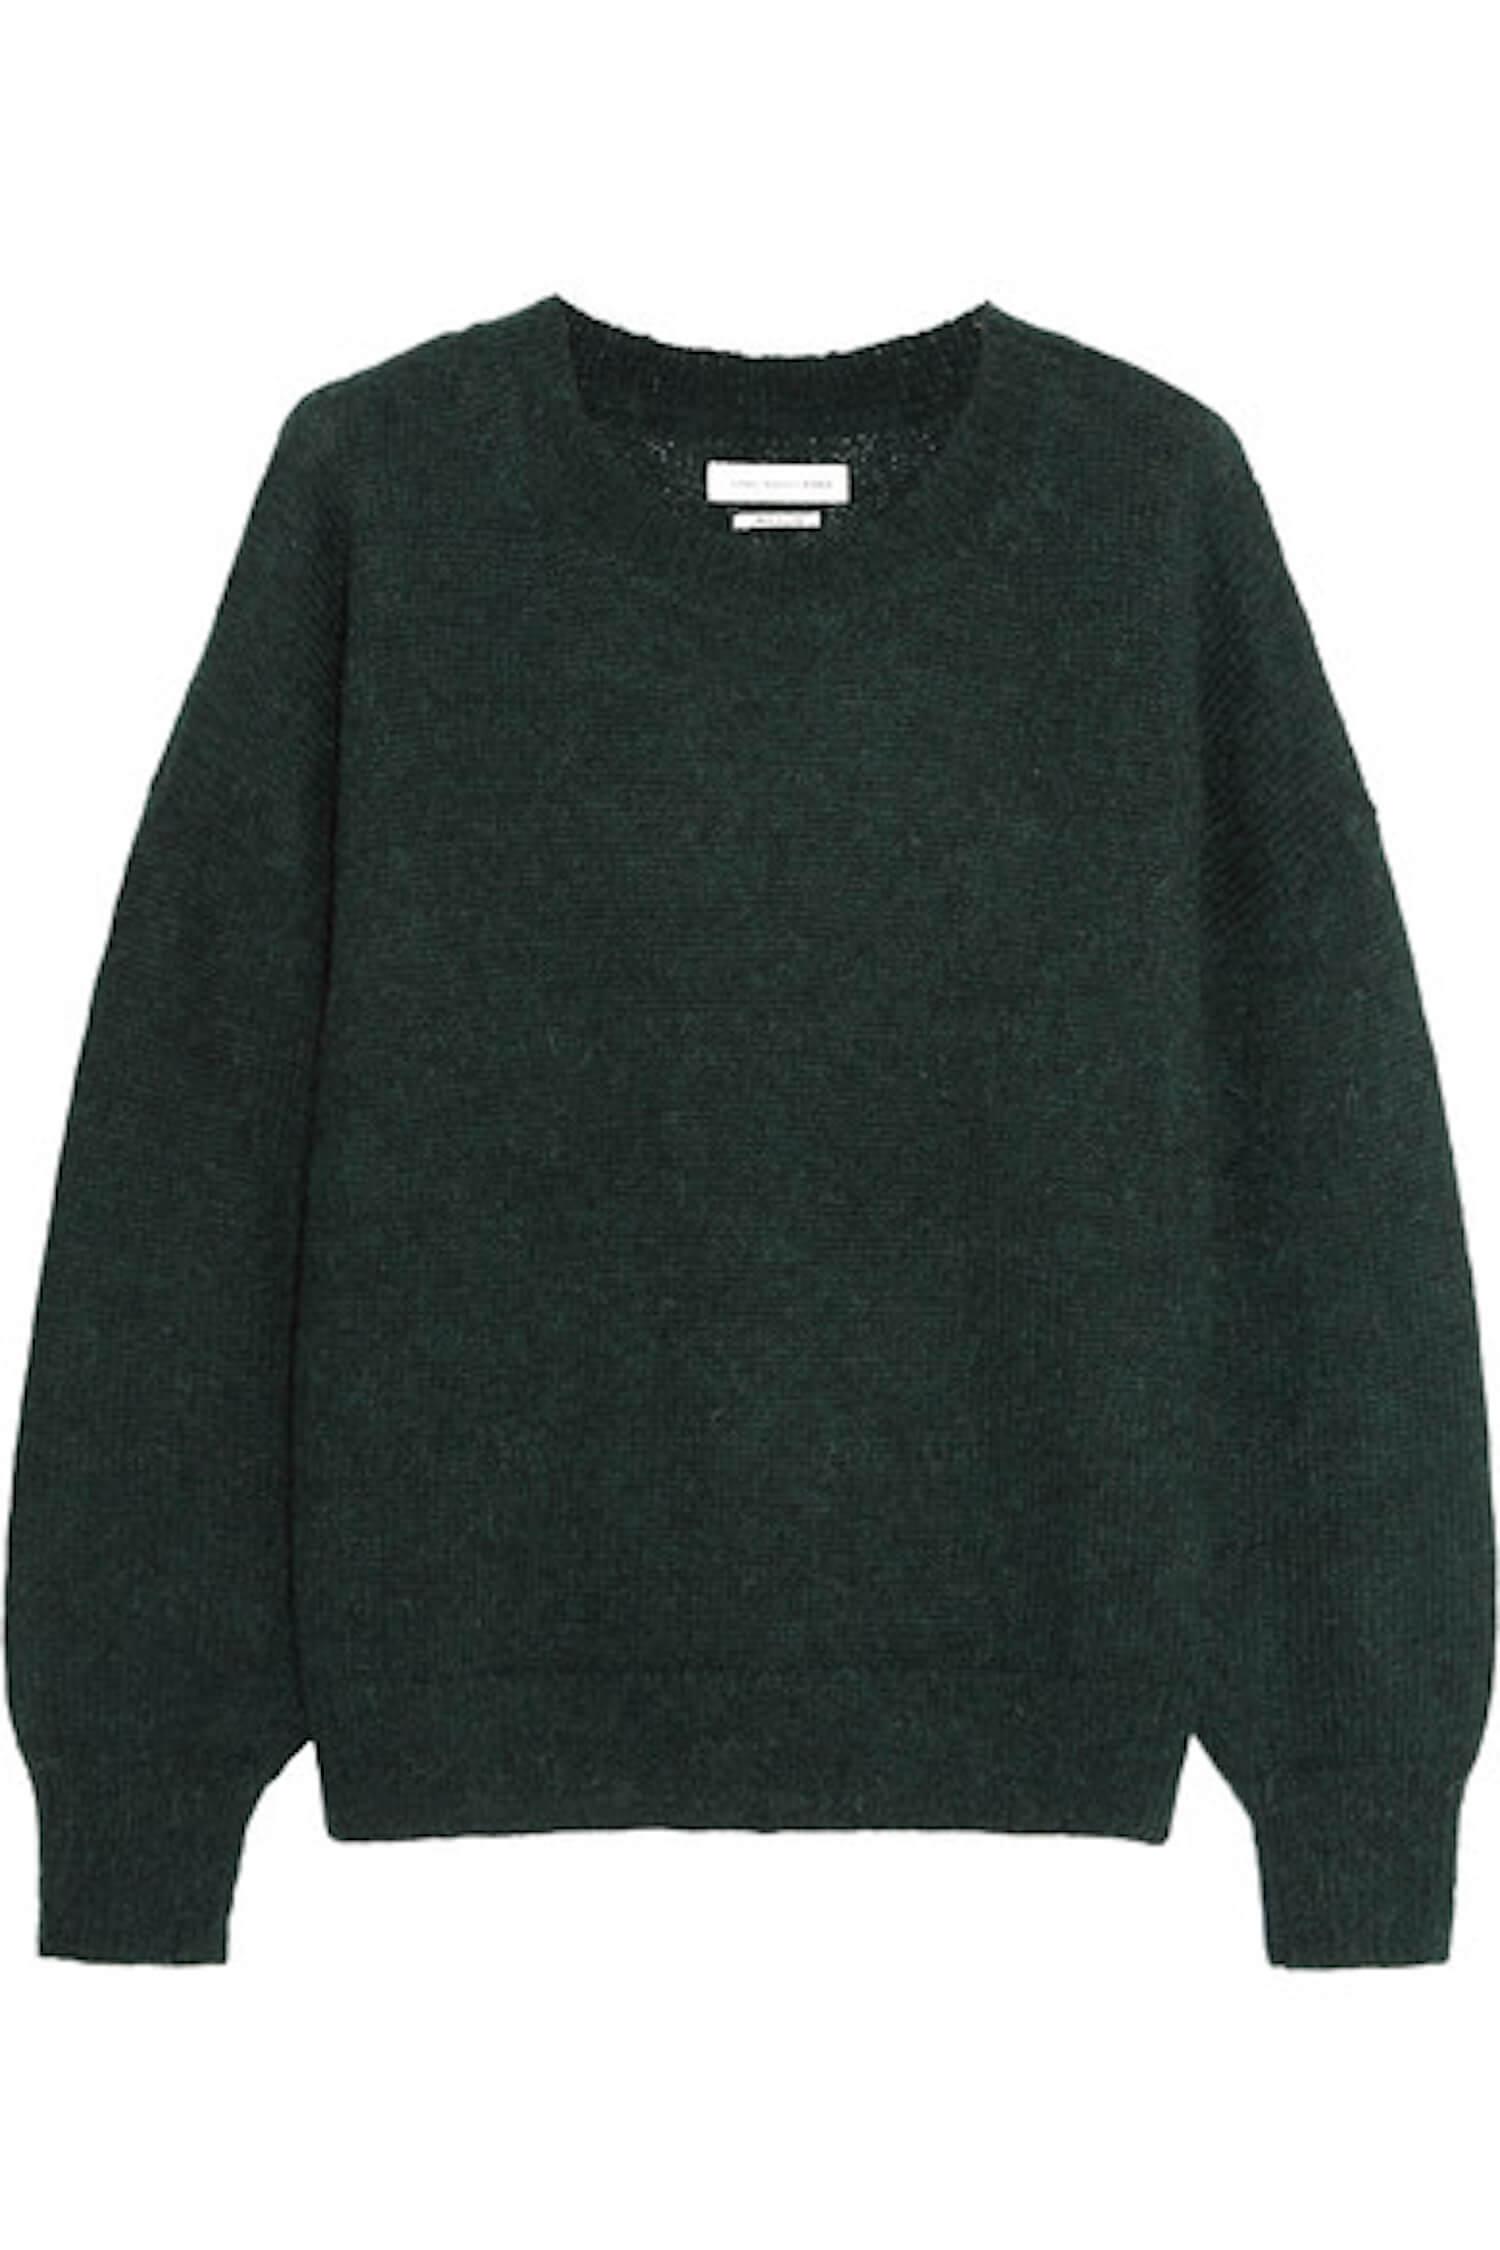 est living the est edit isabel marant sweater